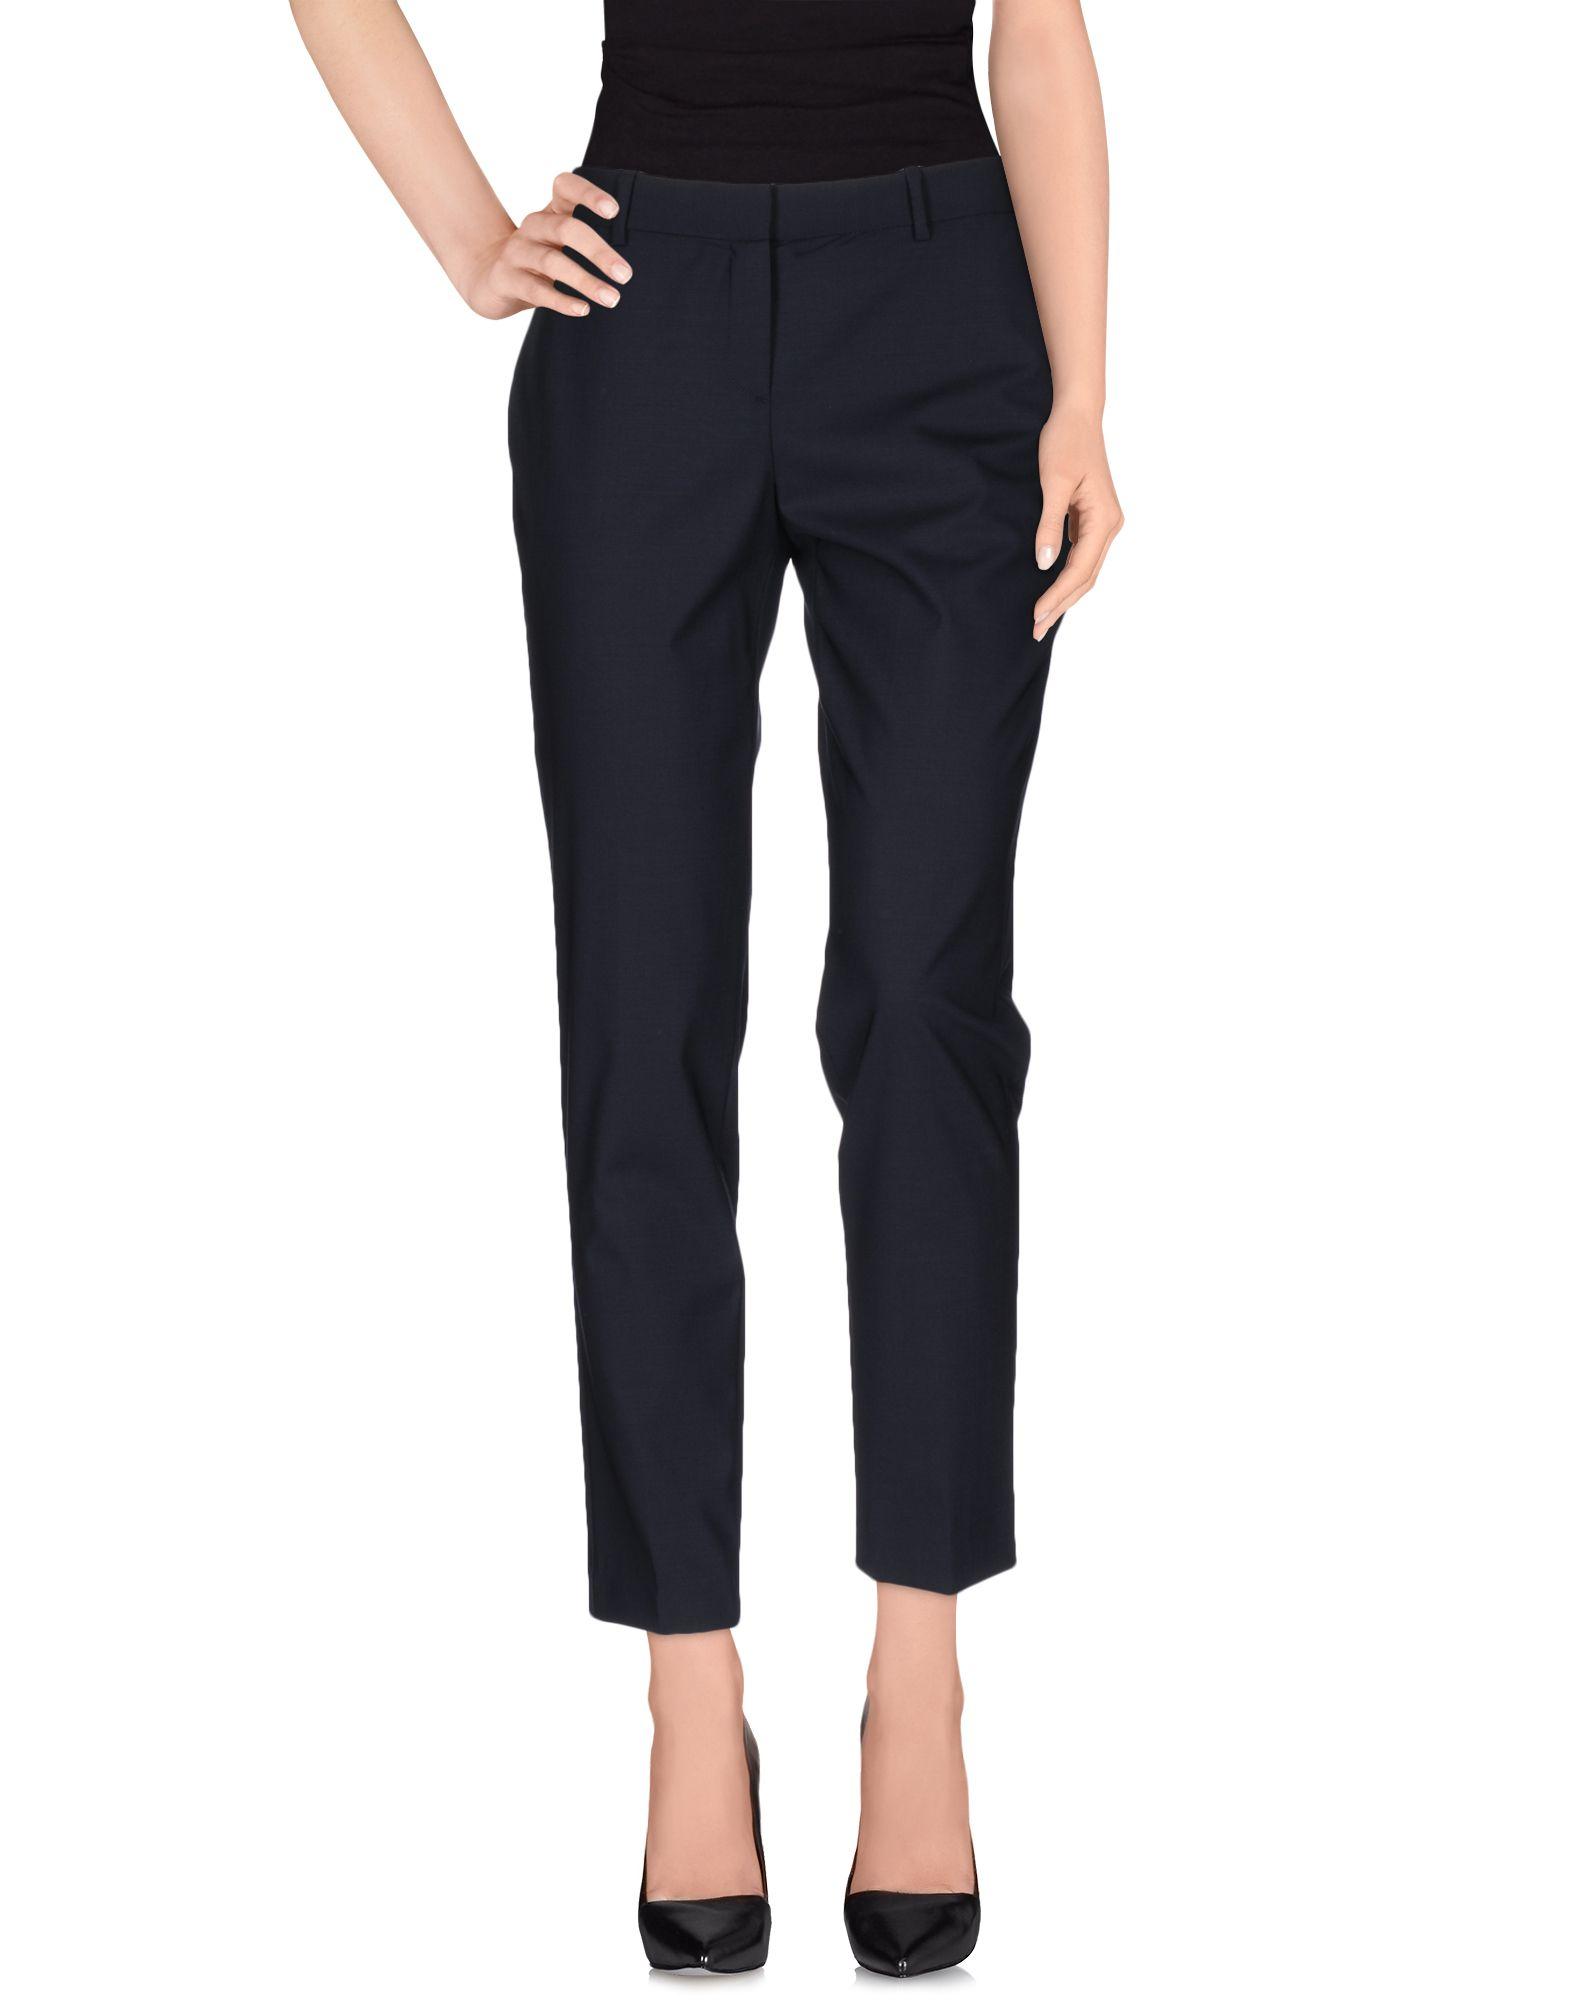 Pantalone Theory Donna - Acquista online su xLABAuH40q